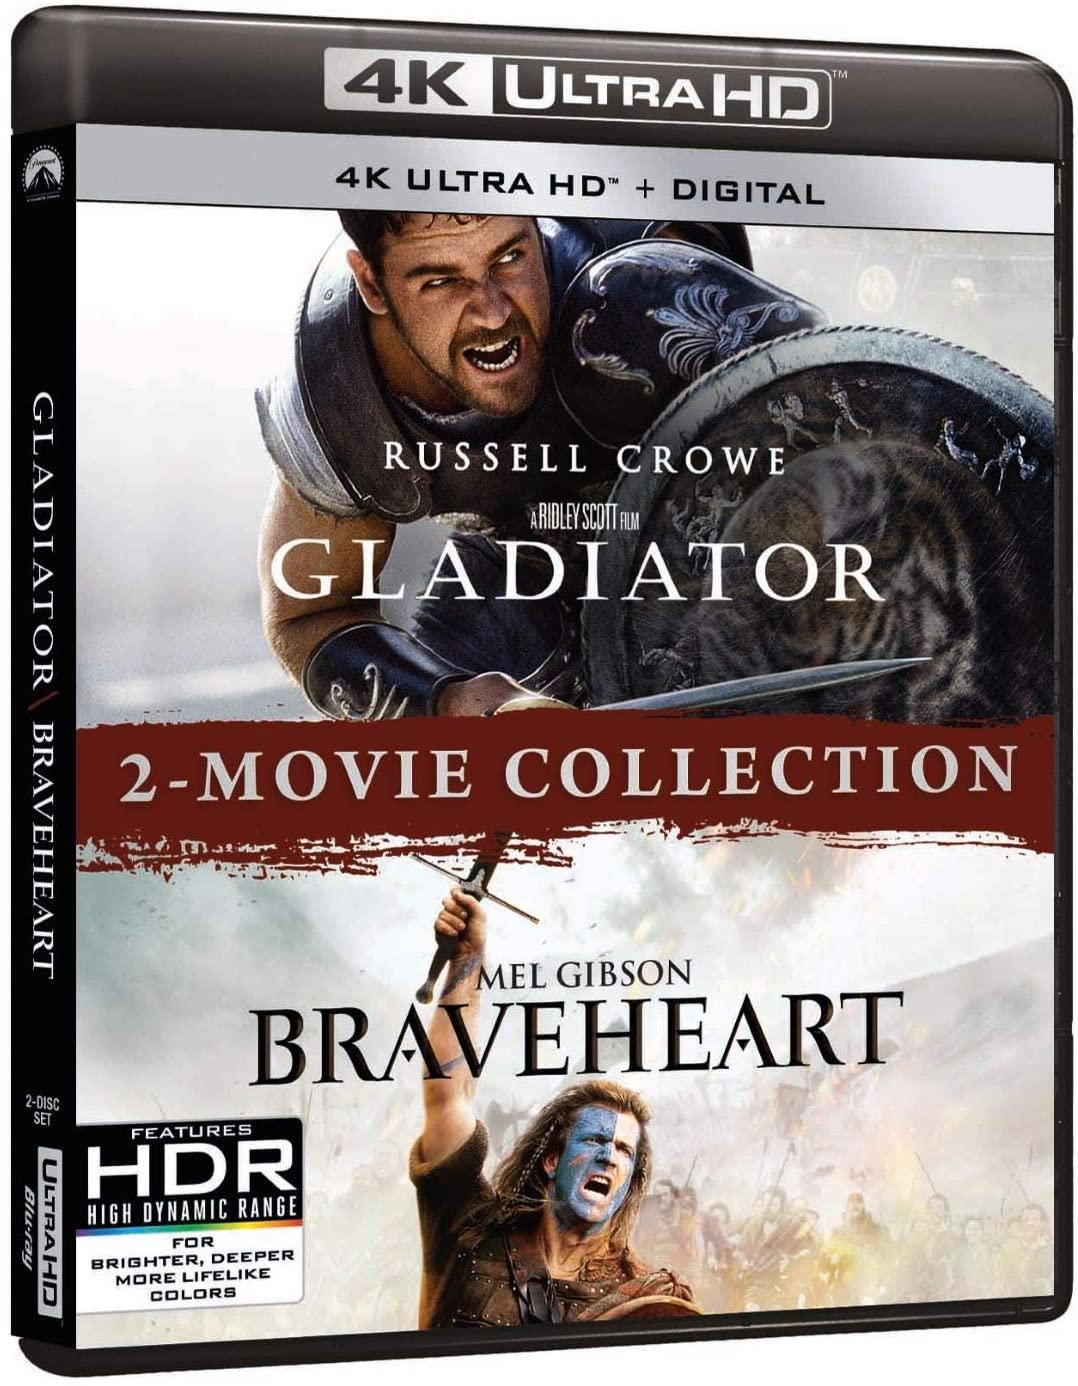 Gladiator/Braveheart 2-Movie Collection en Blu-ray 4K